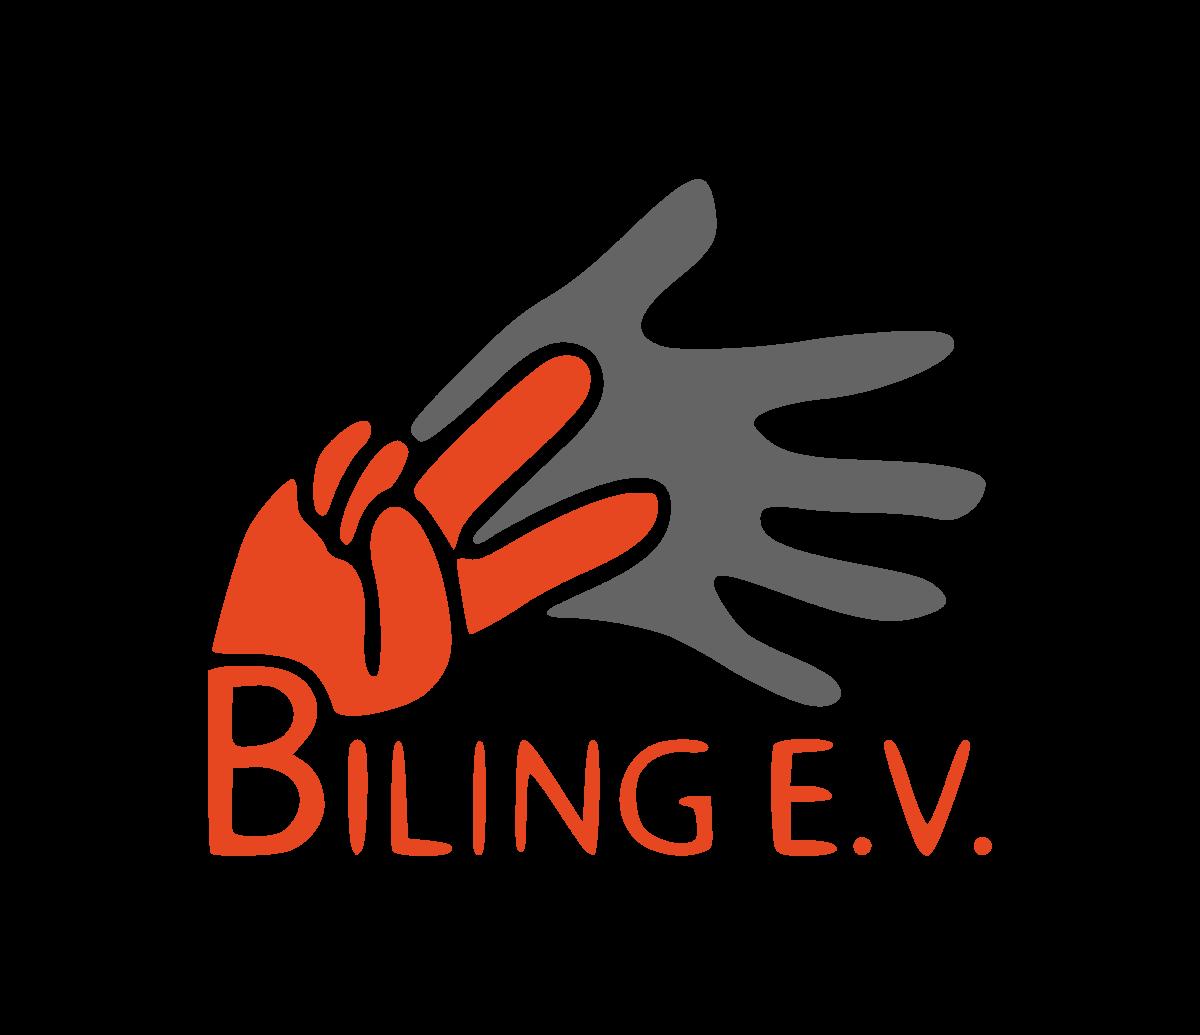 Logo Biling e.V.